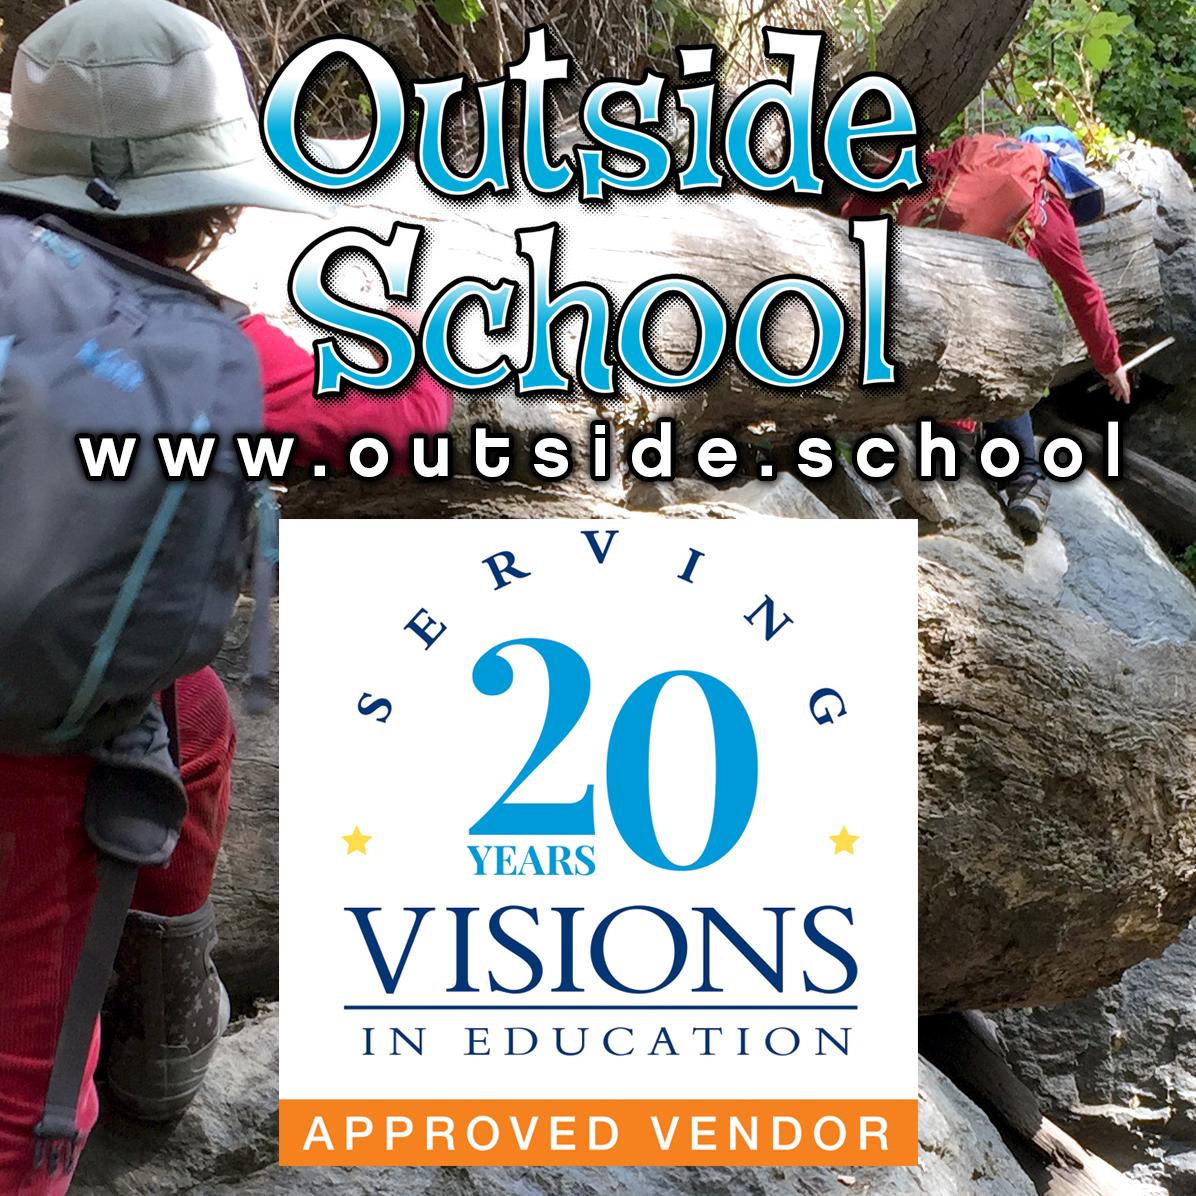 Outside-School-Visions-in-Education.jpg